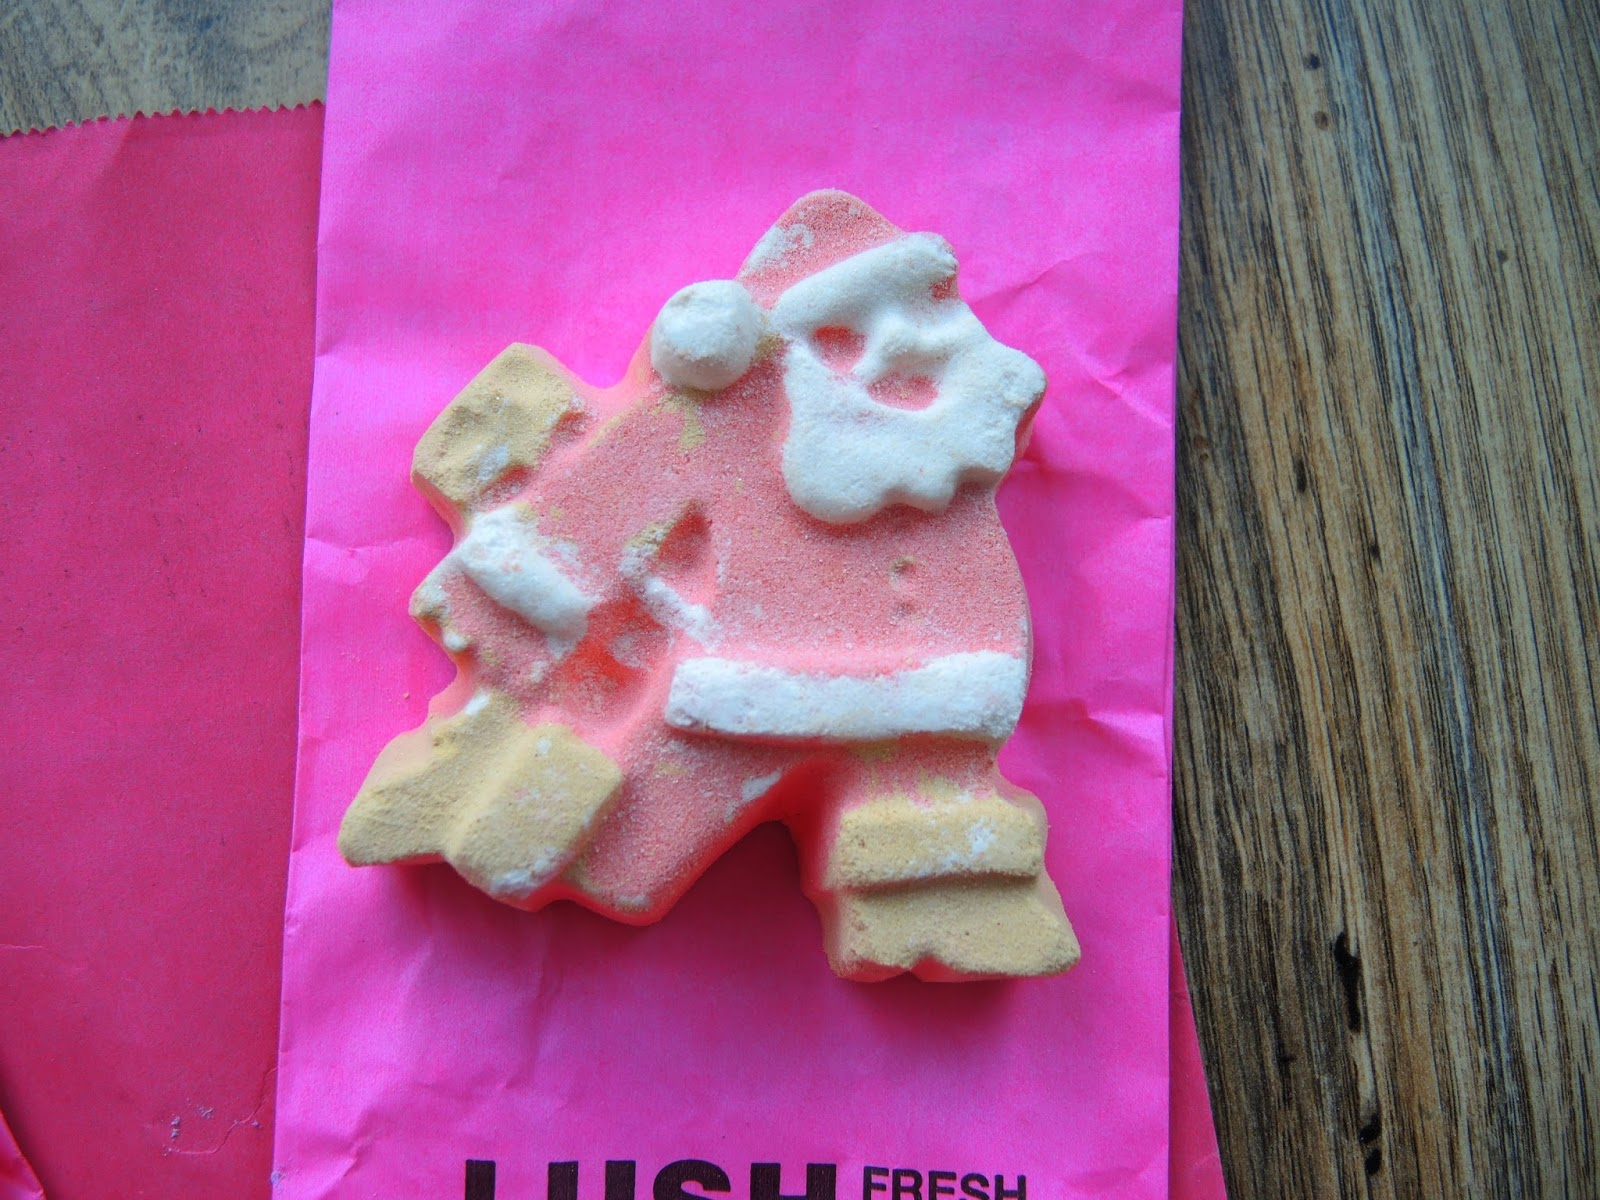 Lush Dashing Santa Bath Bomb